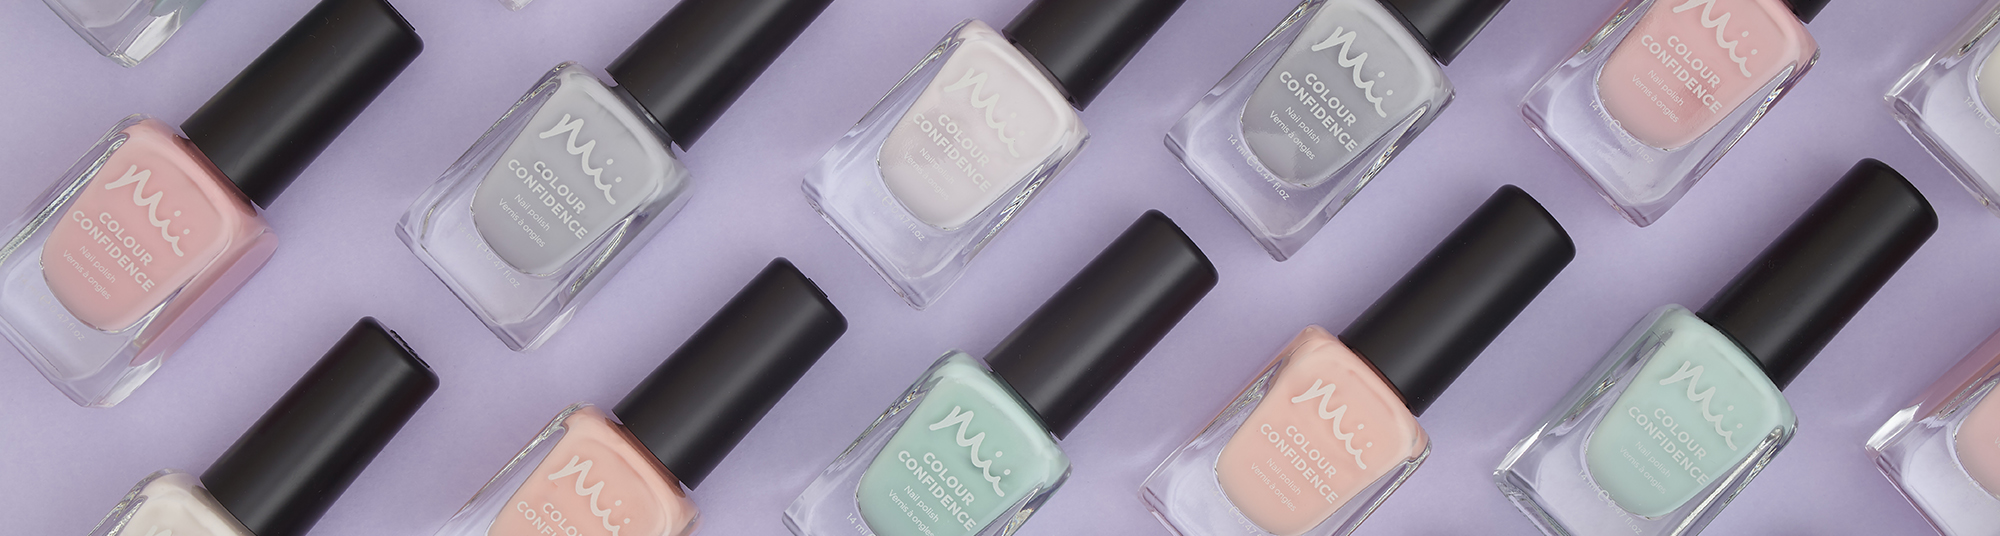 Mii Mii Colour Confidence Nail Polish Pastel Category